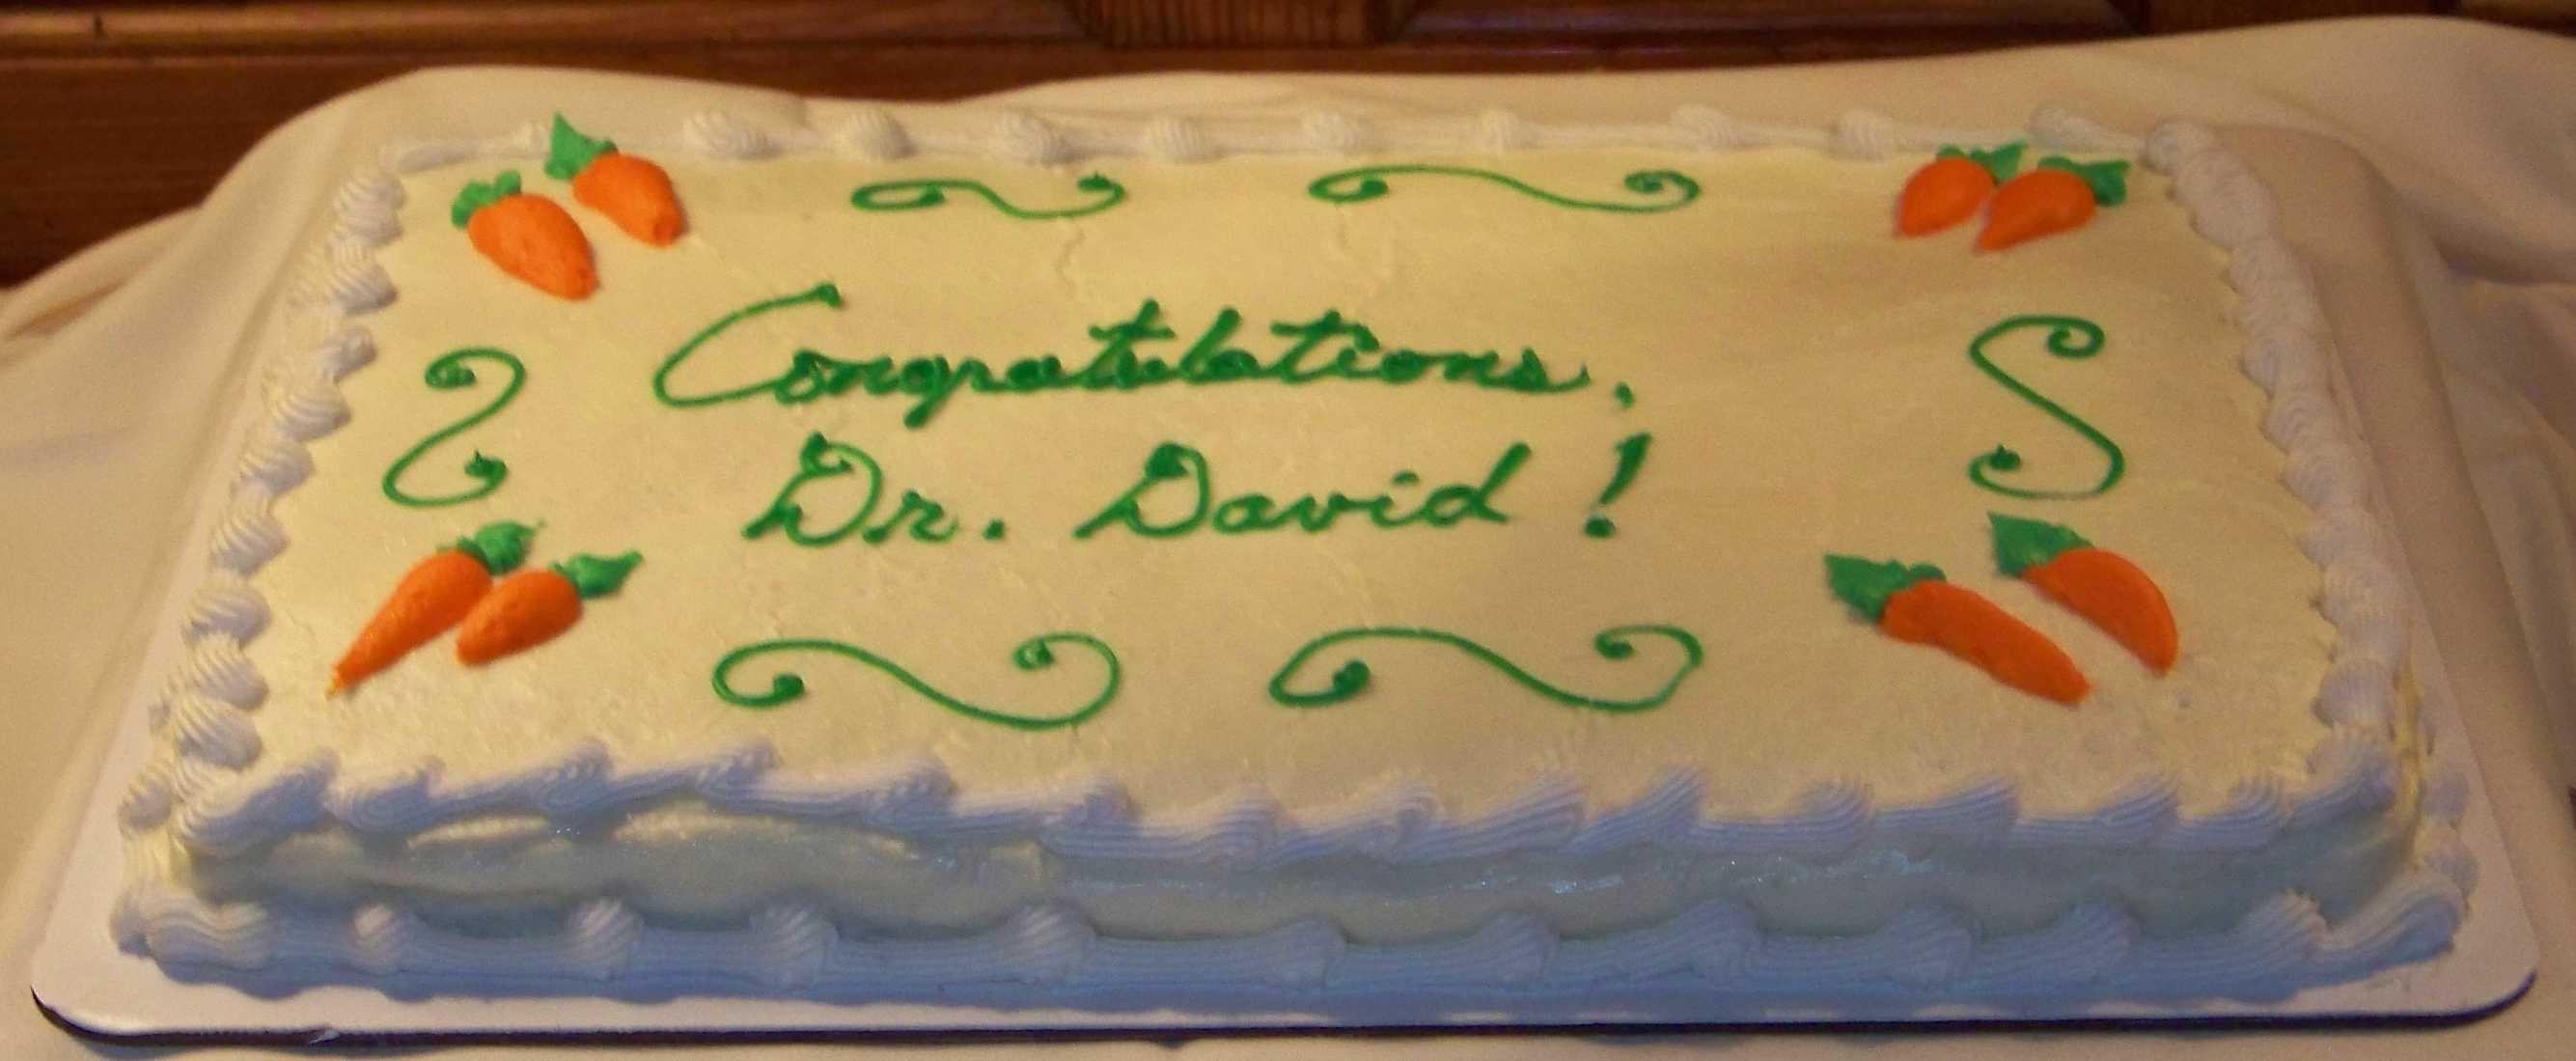 Dr. Dave Cake